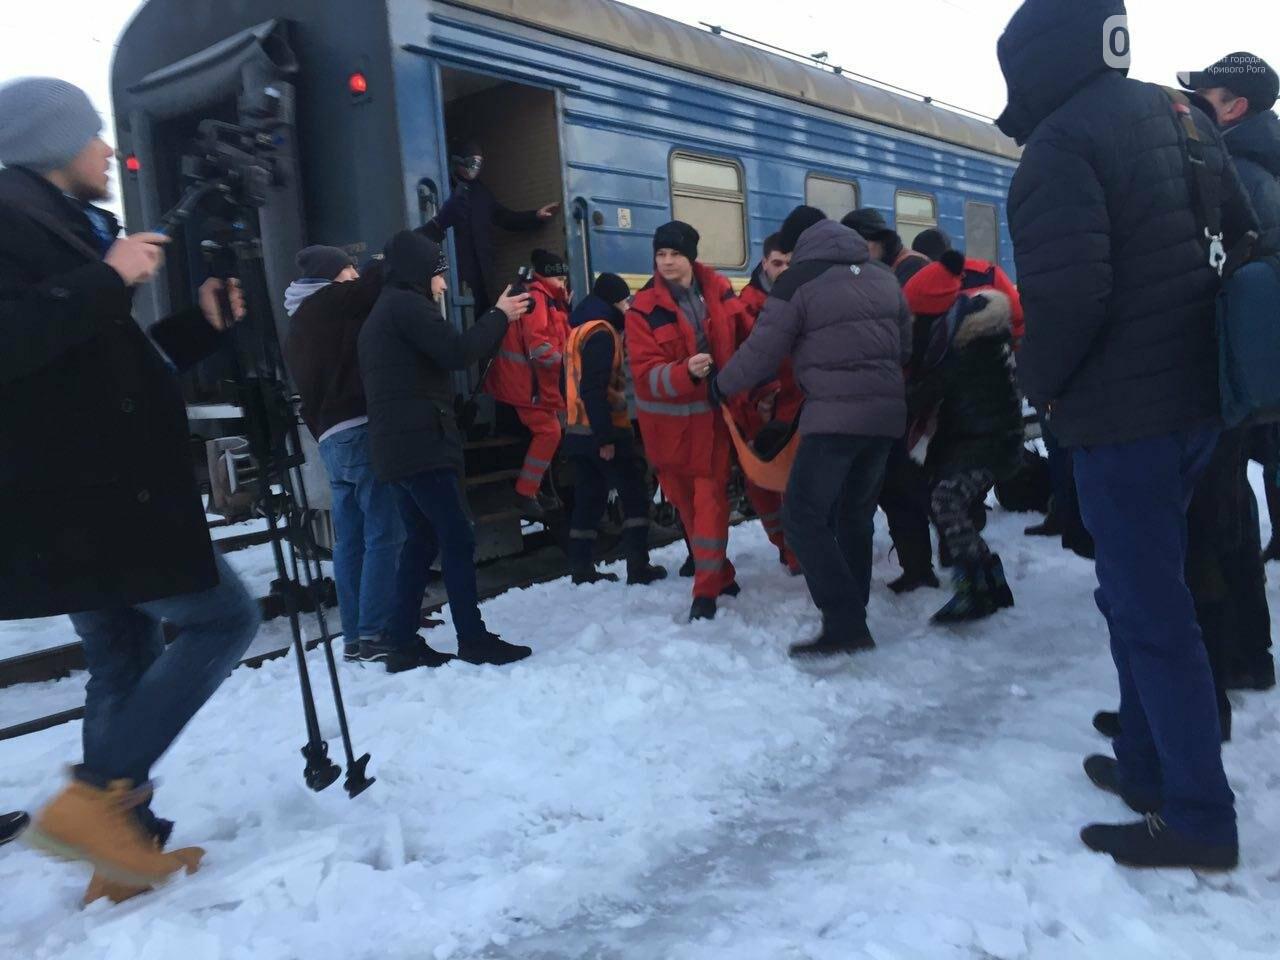 В Кривой Рог вернулся журналист Вячеслав Волк, тяжело раненый во время учений резервистов (ФОТО), фото-3